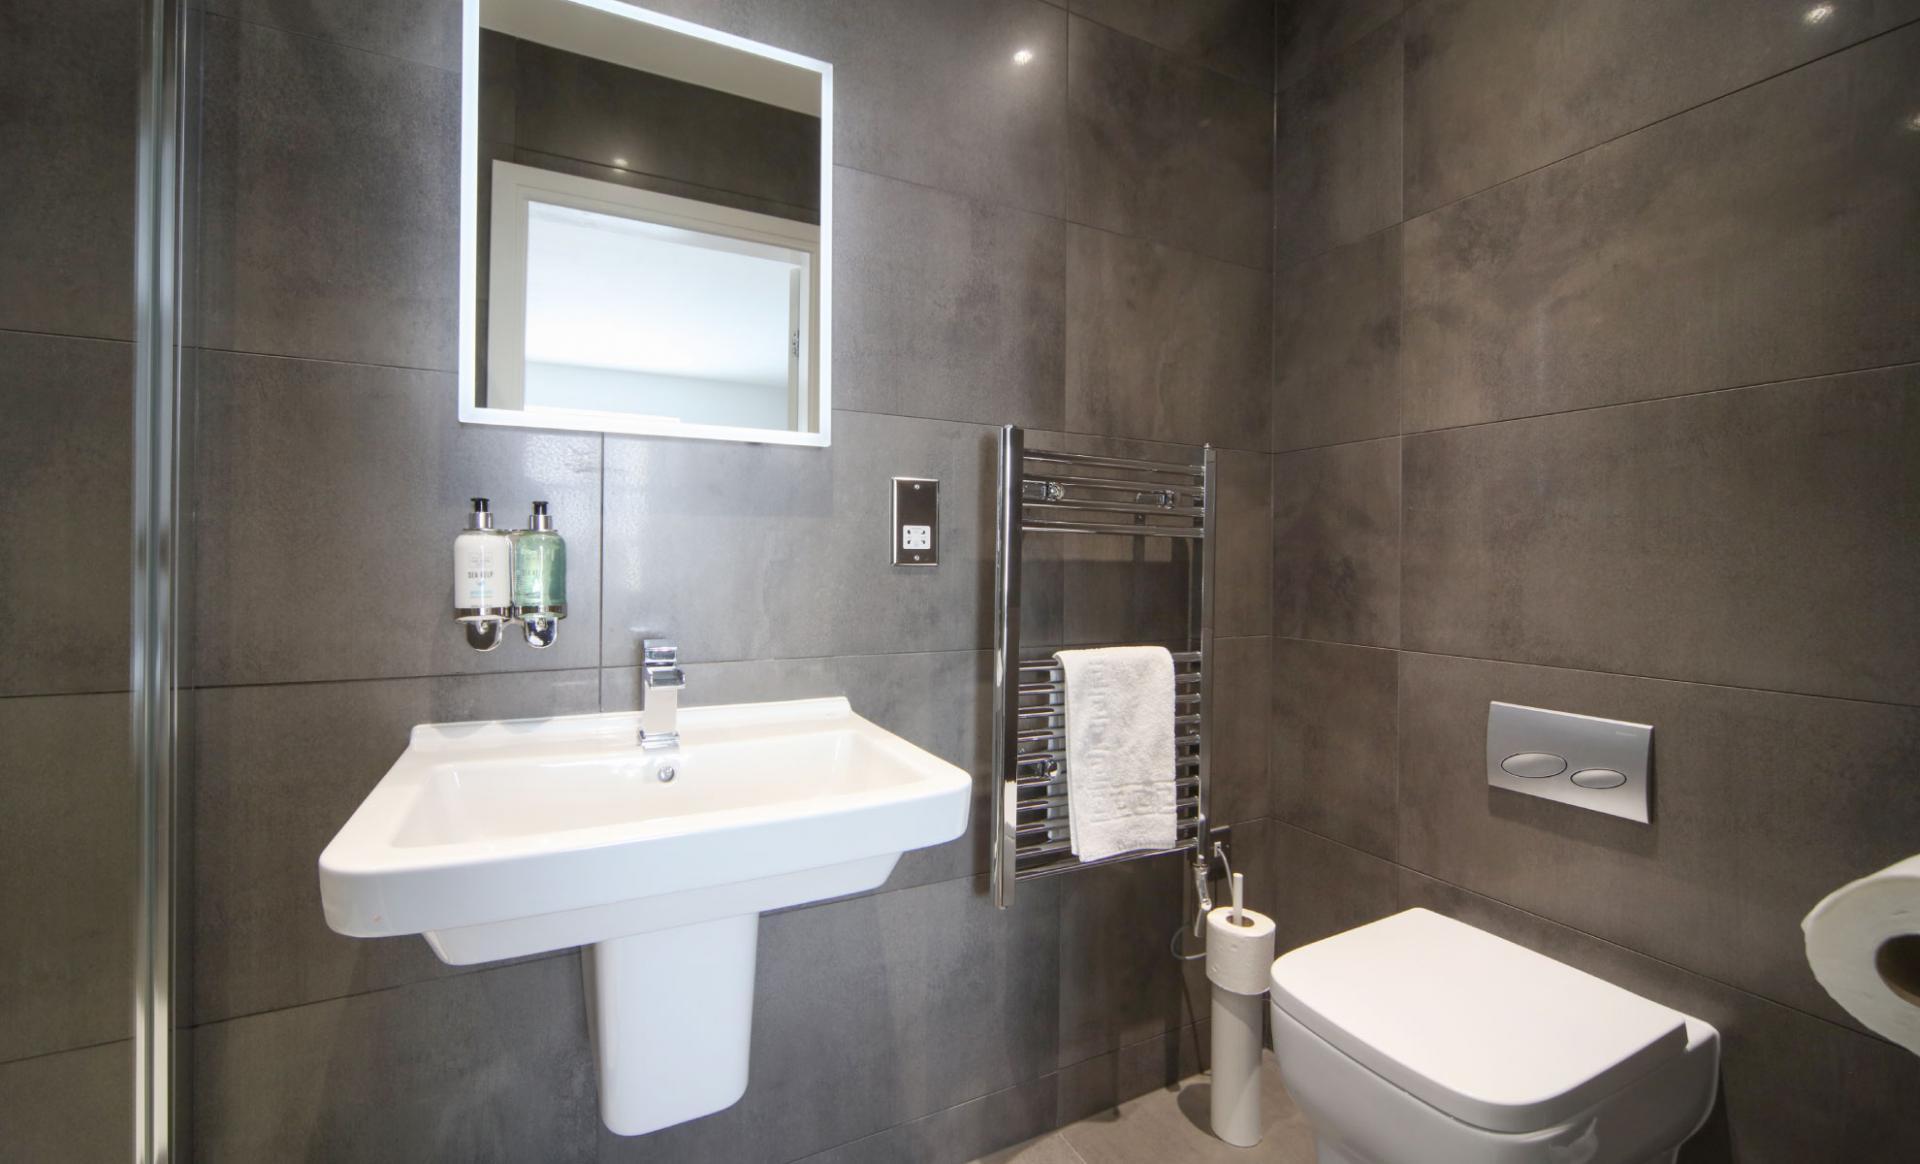 WC at Citystop Apartments, Ropewalks, Liverpool - Citybase Apartments